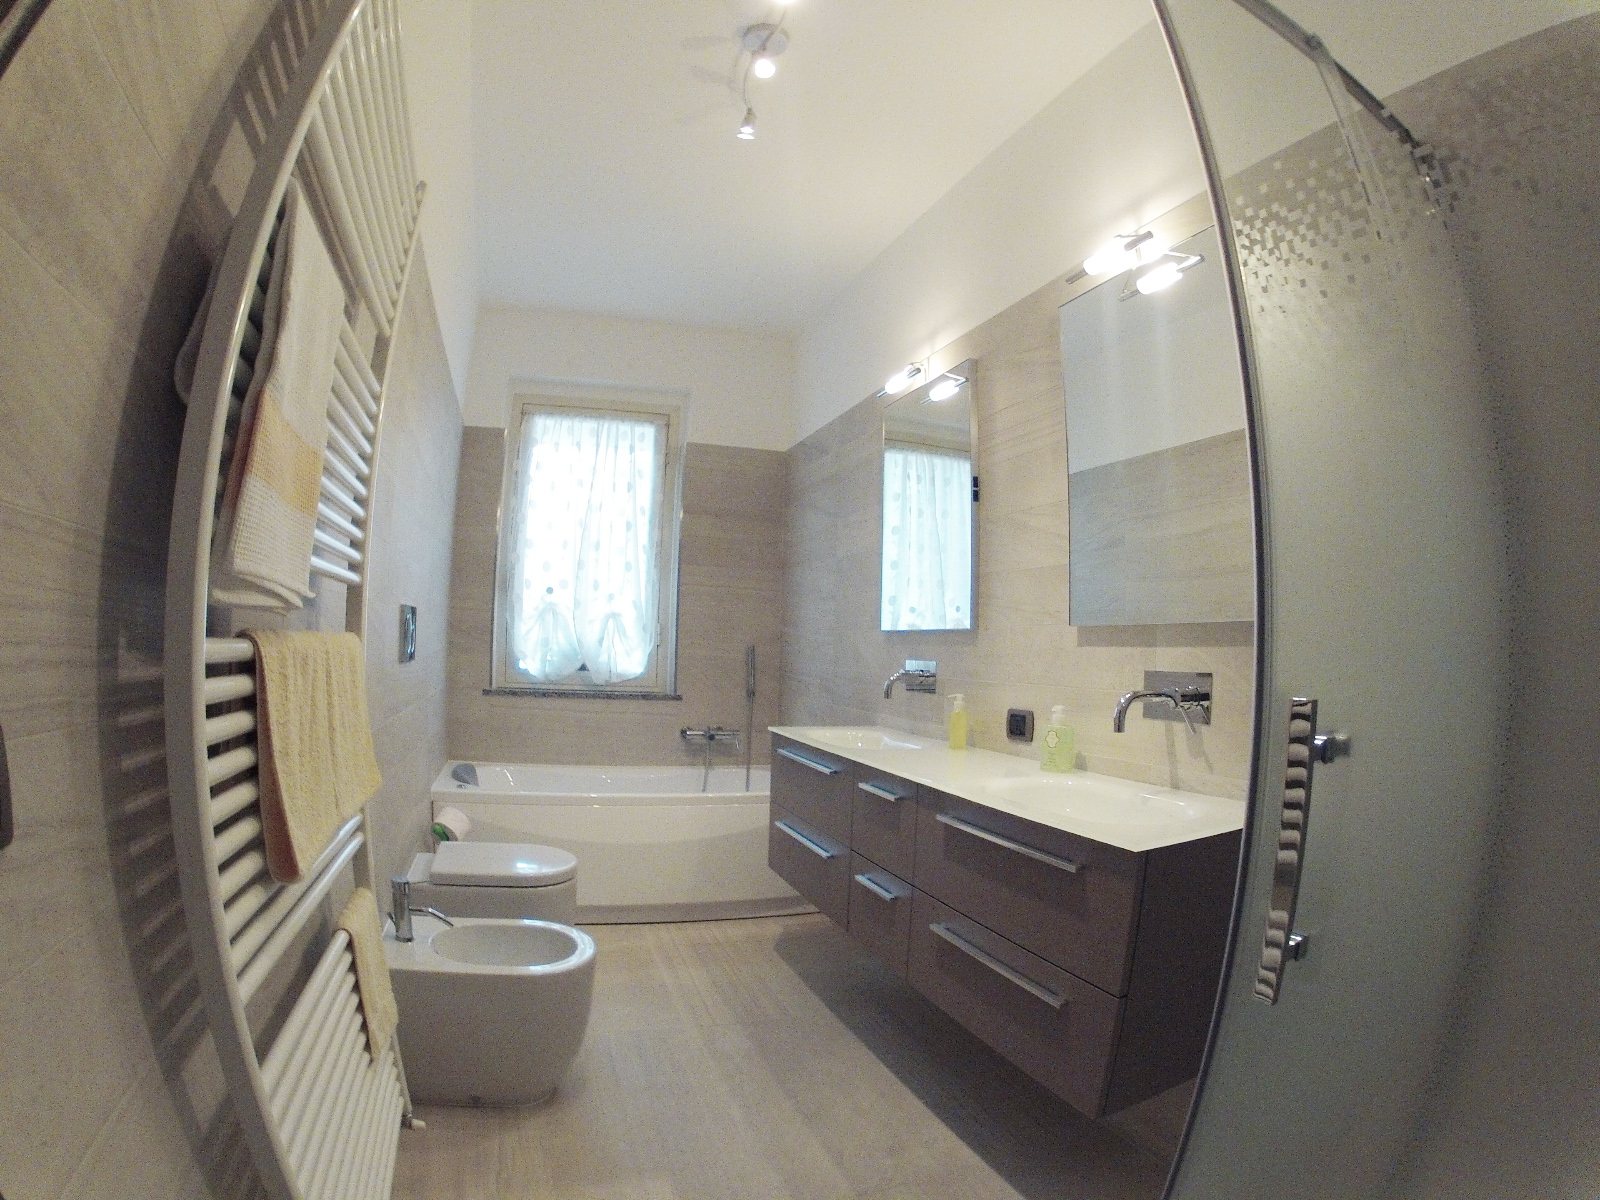 Vasca sotto finestra hu56 regardsdefemmes for Arredo bagno con box doccia